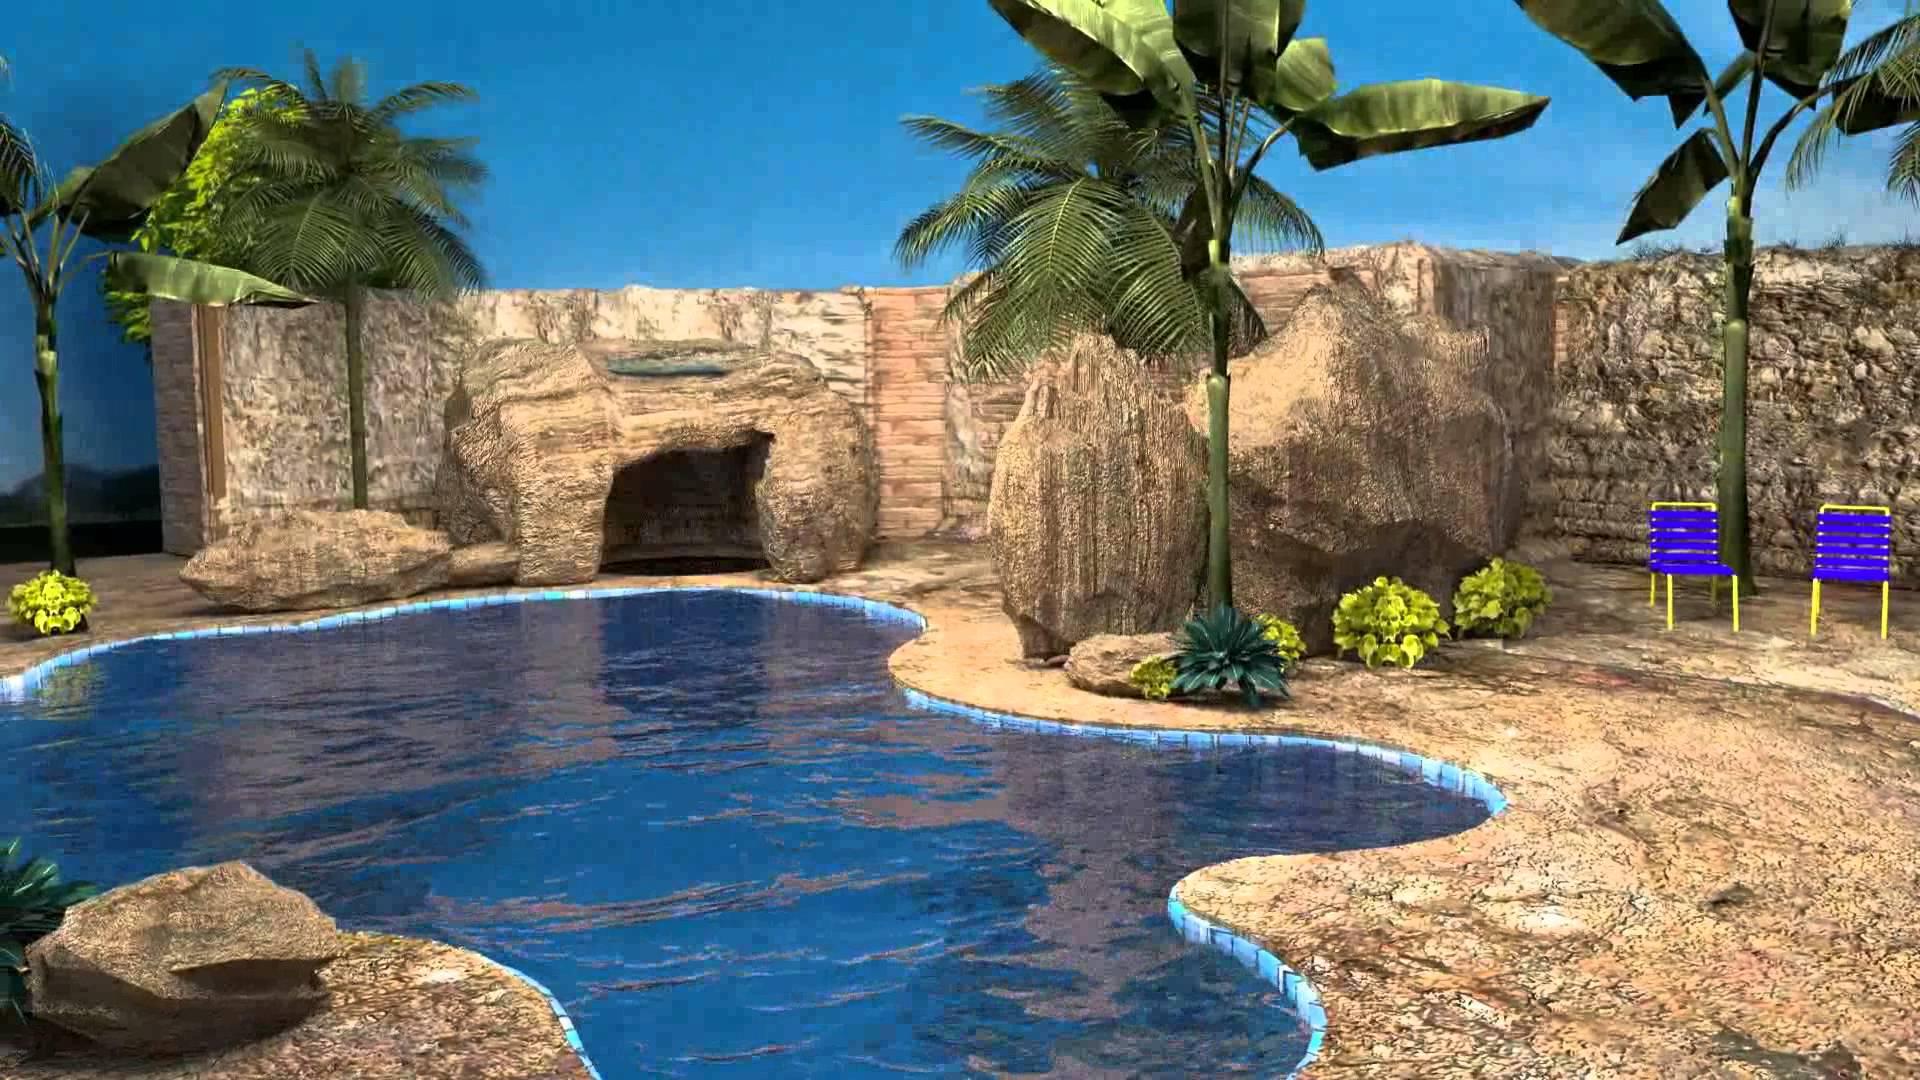 Backyard Tropical Swimming Pool - YouTube